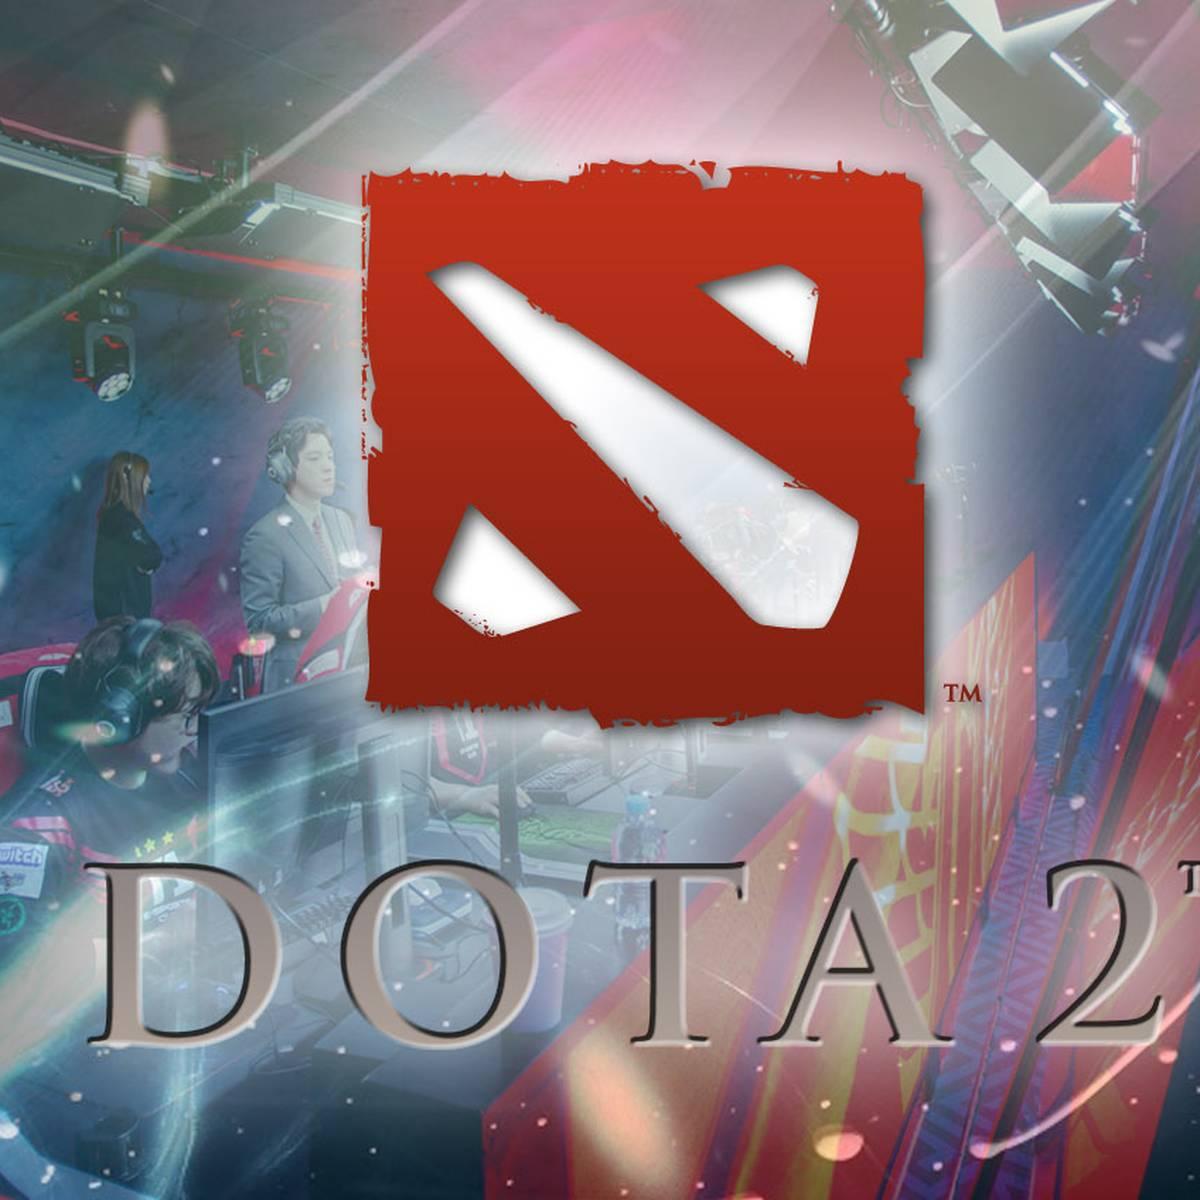 Tutorial Folge #1 - Was ist Dota 2?